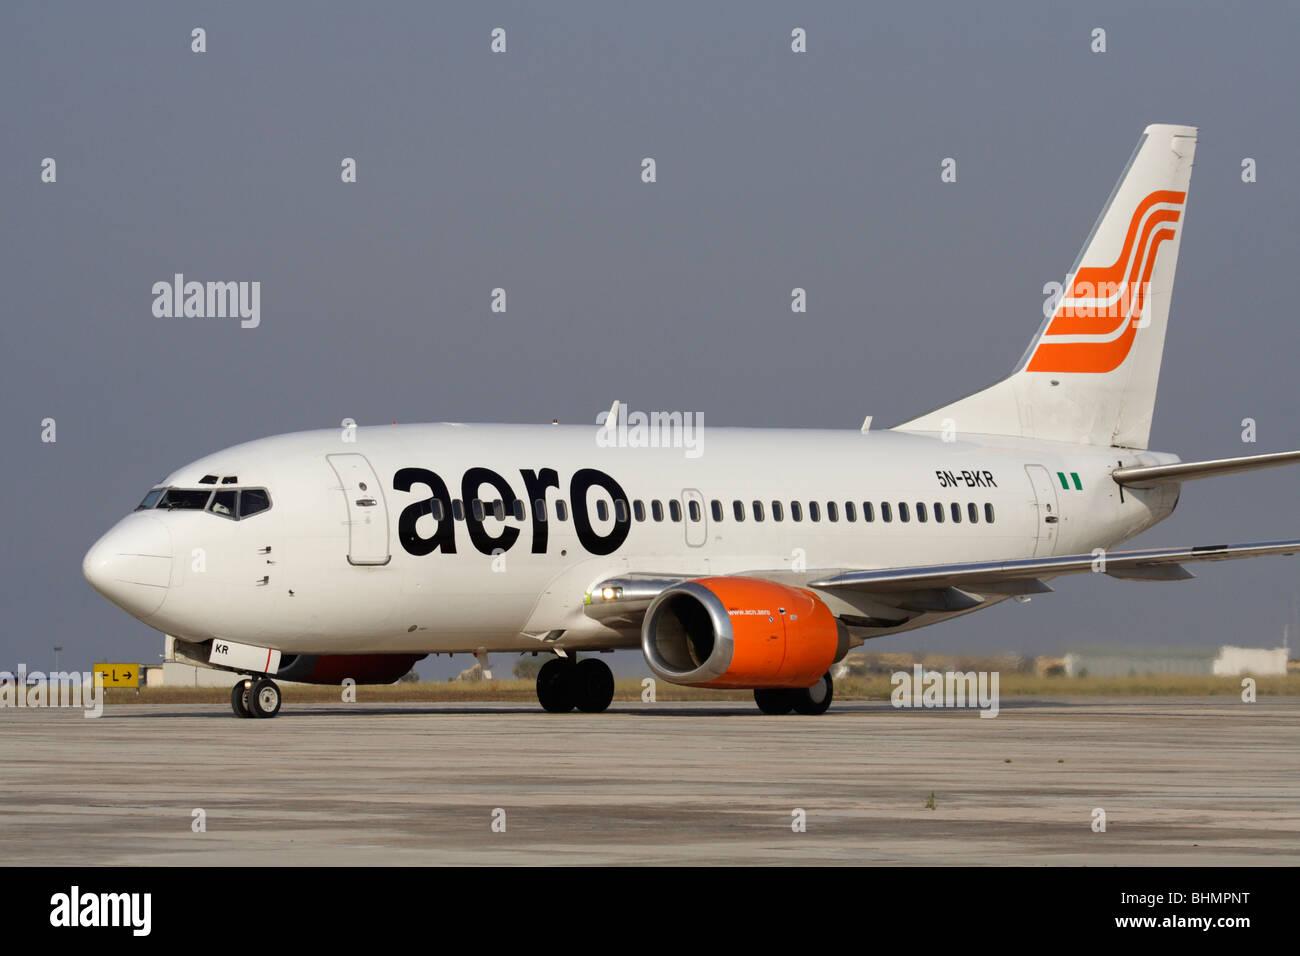 Aero Contractors Nigeria Boeing 737-500 - Stock Image